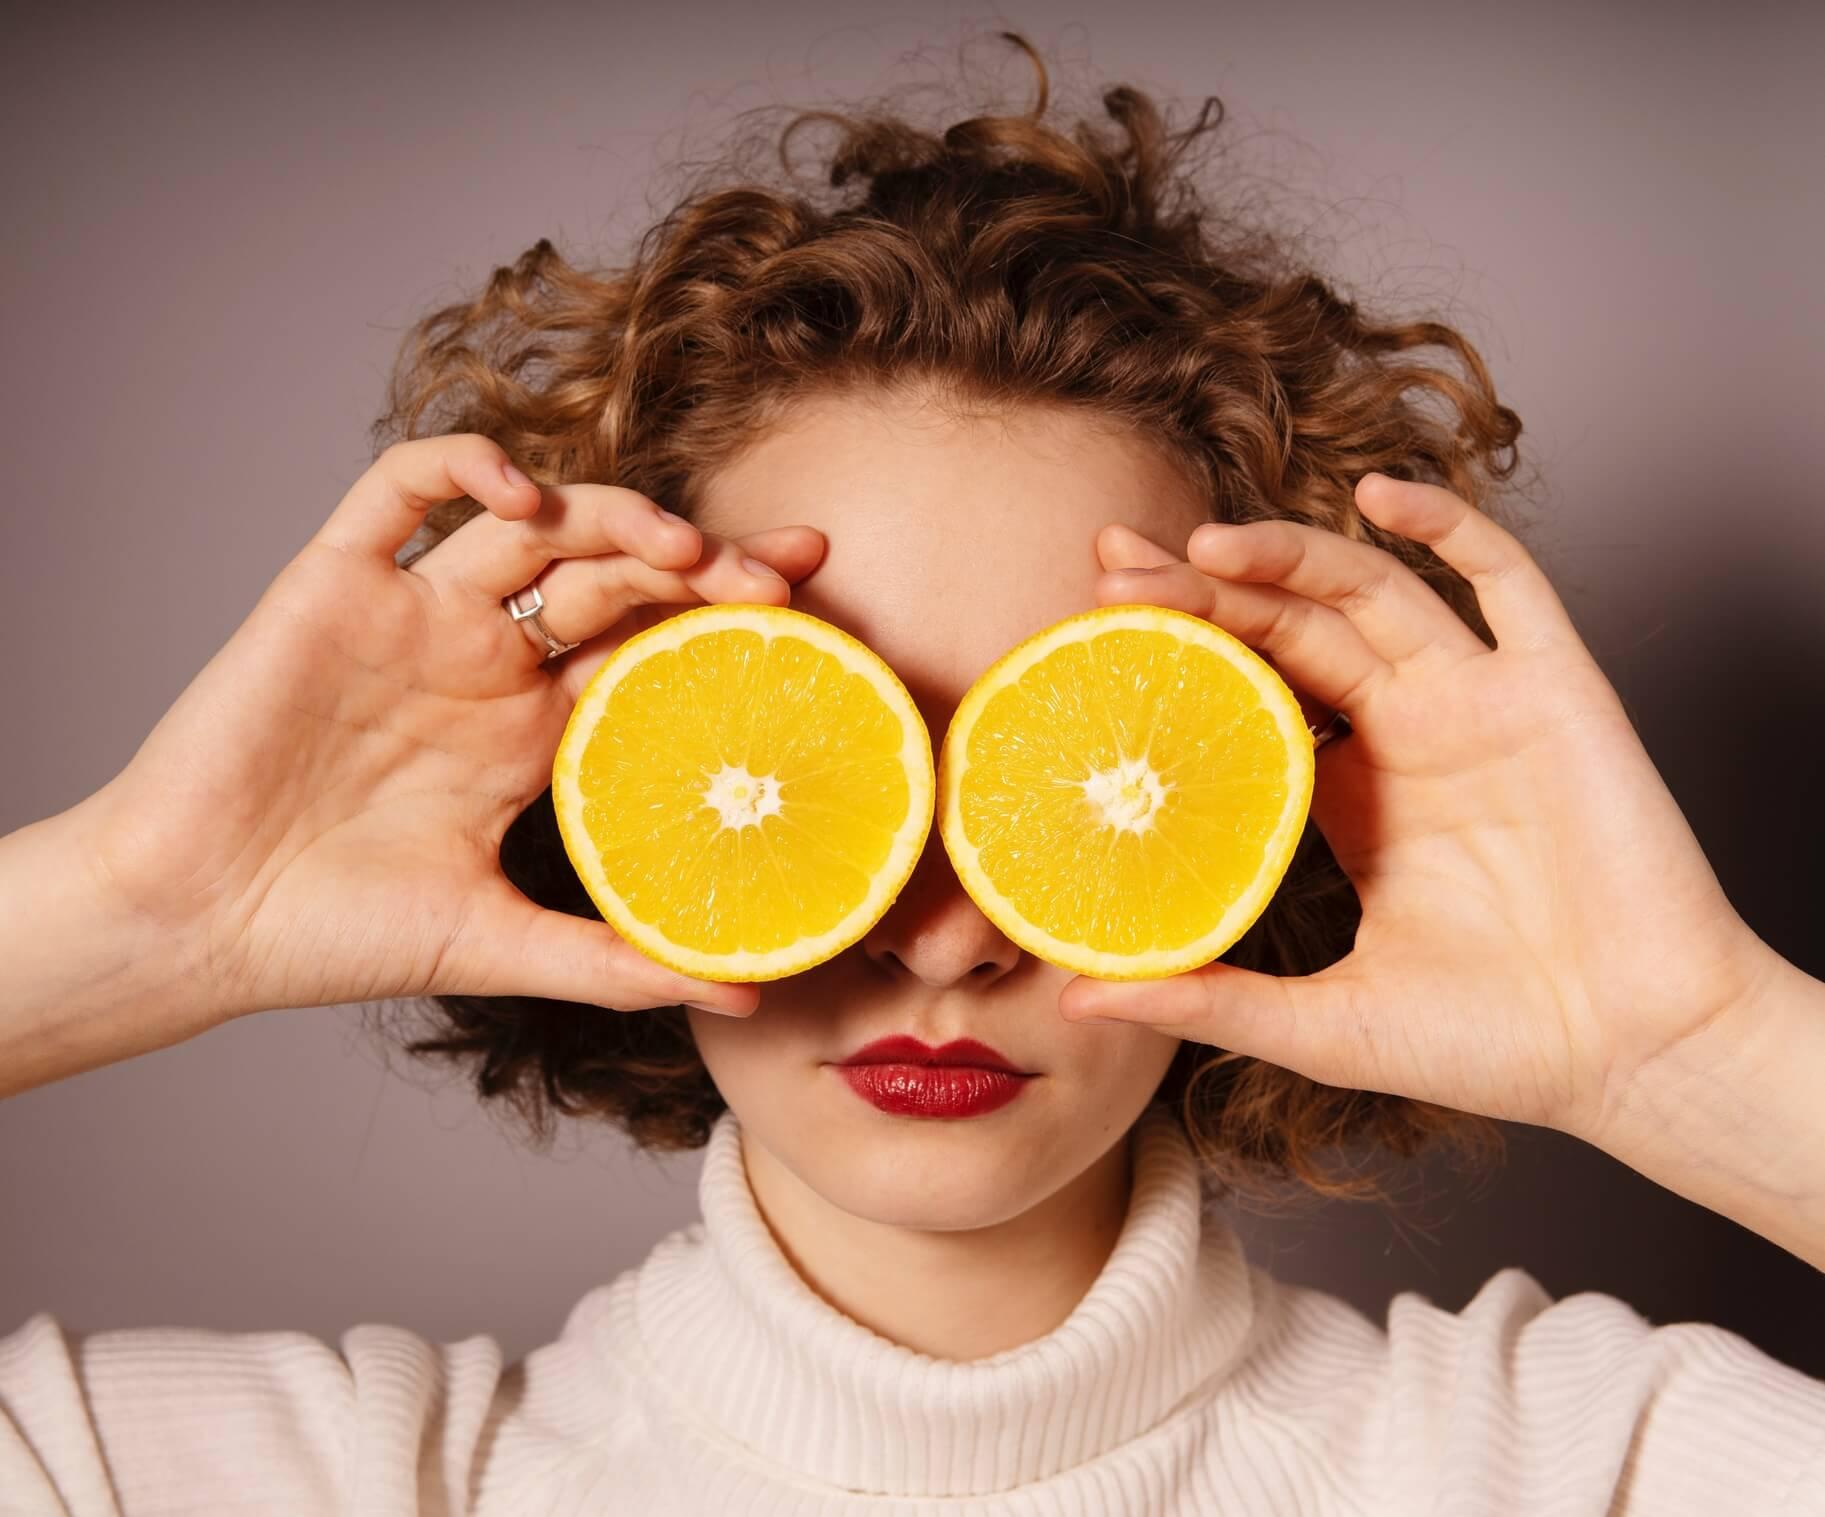 Importance of Vitamin C in skin health